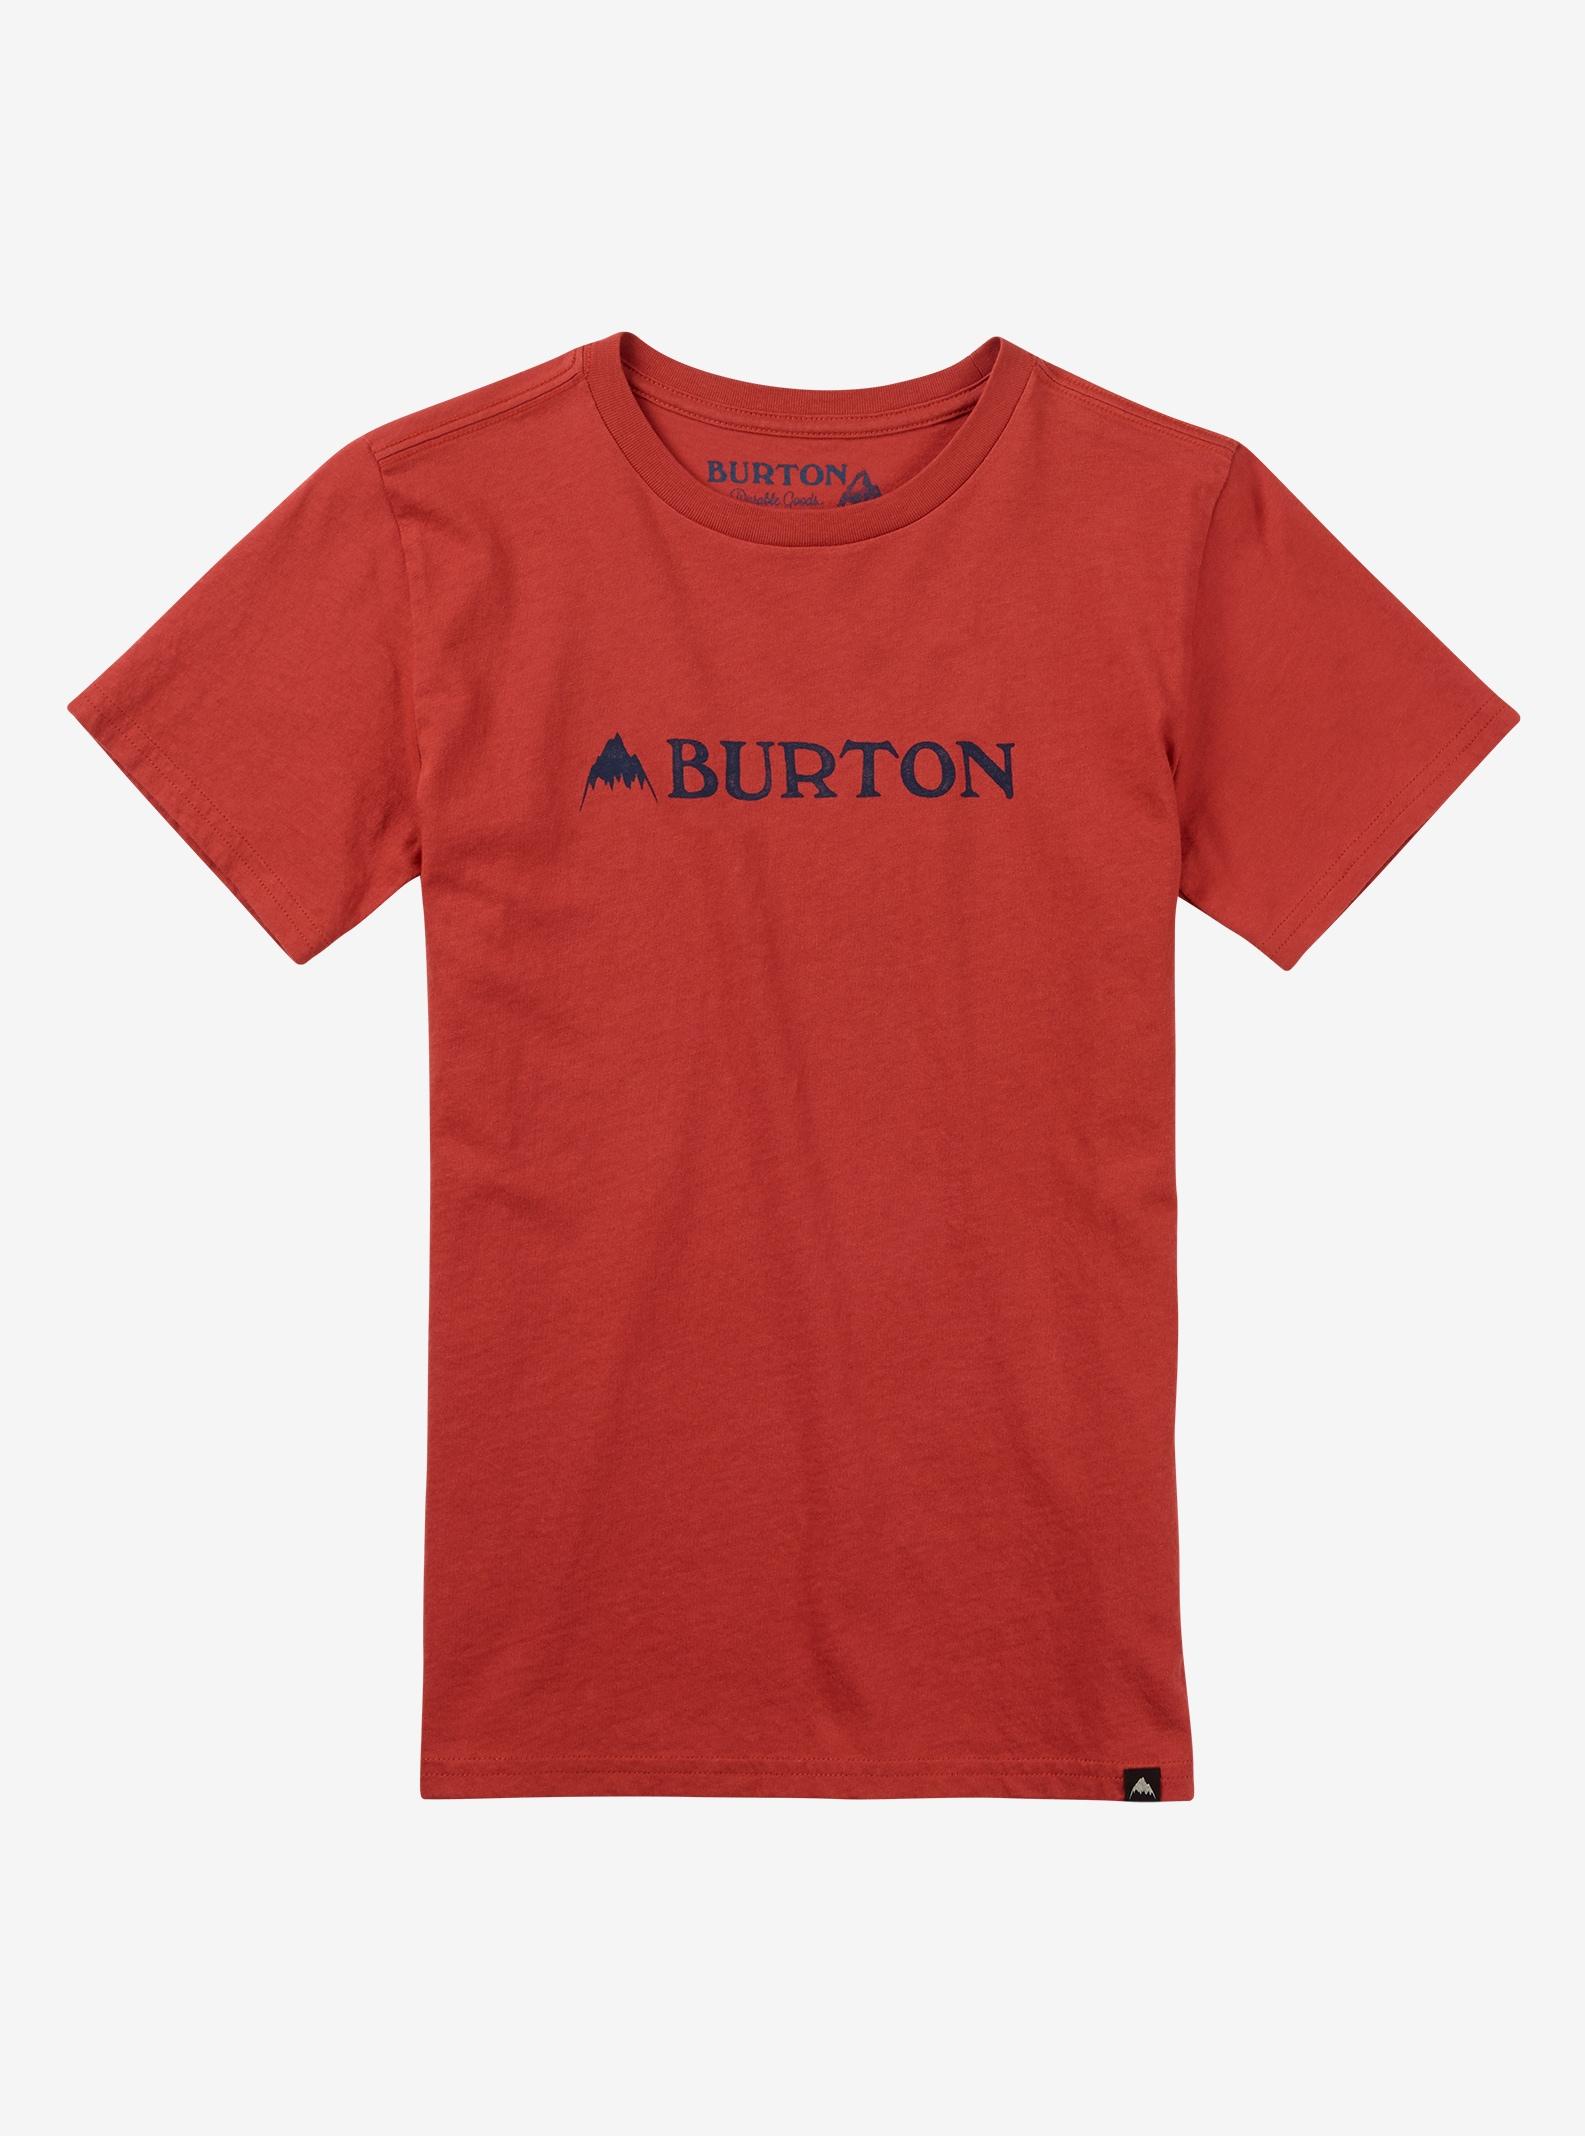 Burton Boys' Mountain Horizontal Short Sleeve T Shirt shown in Tandori